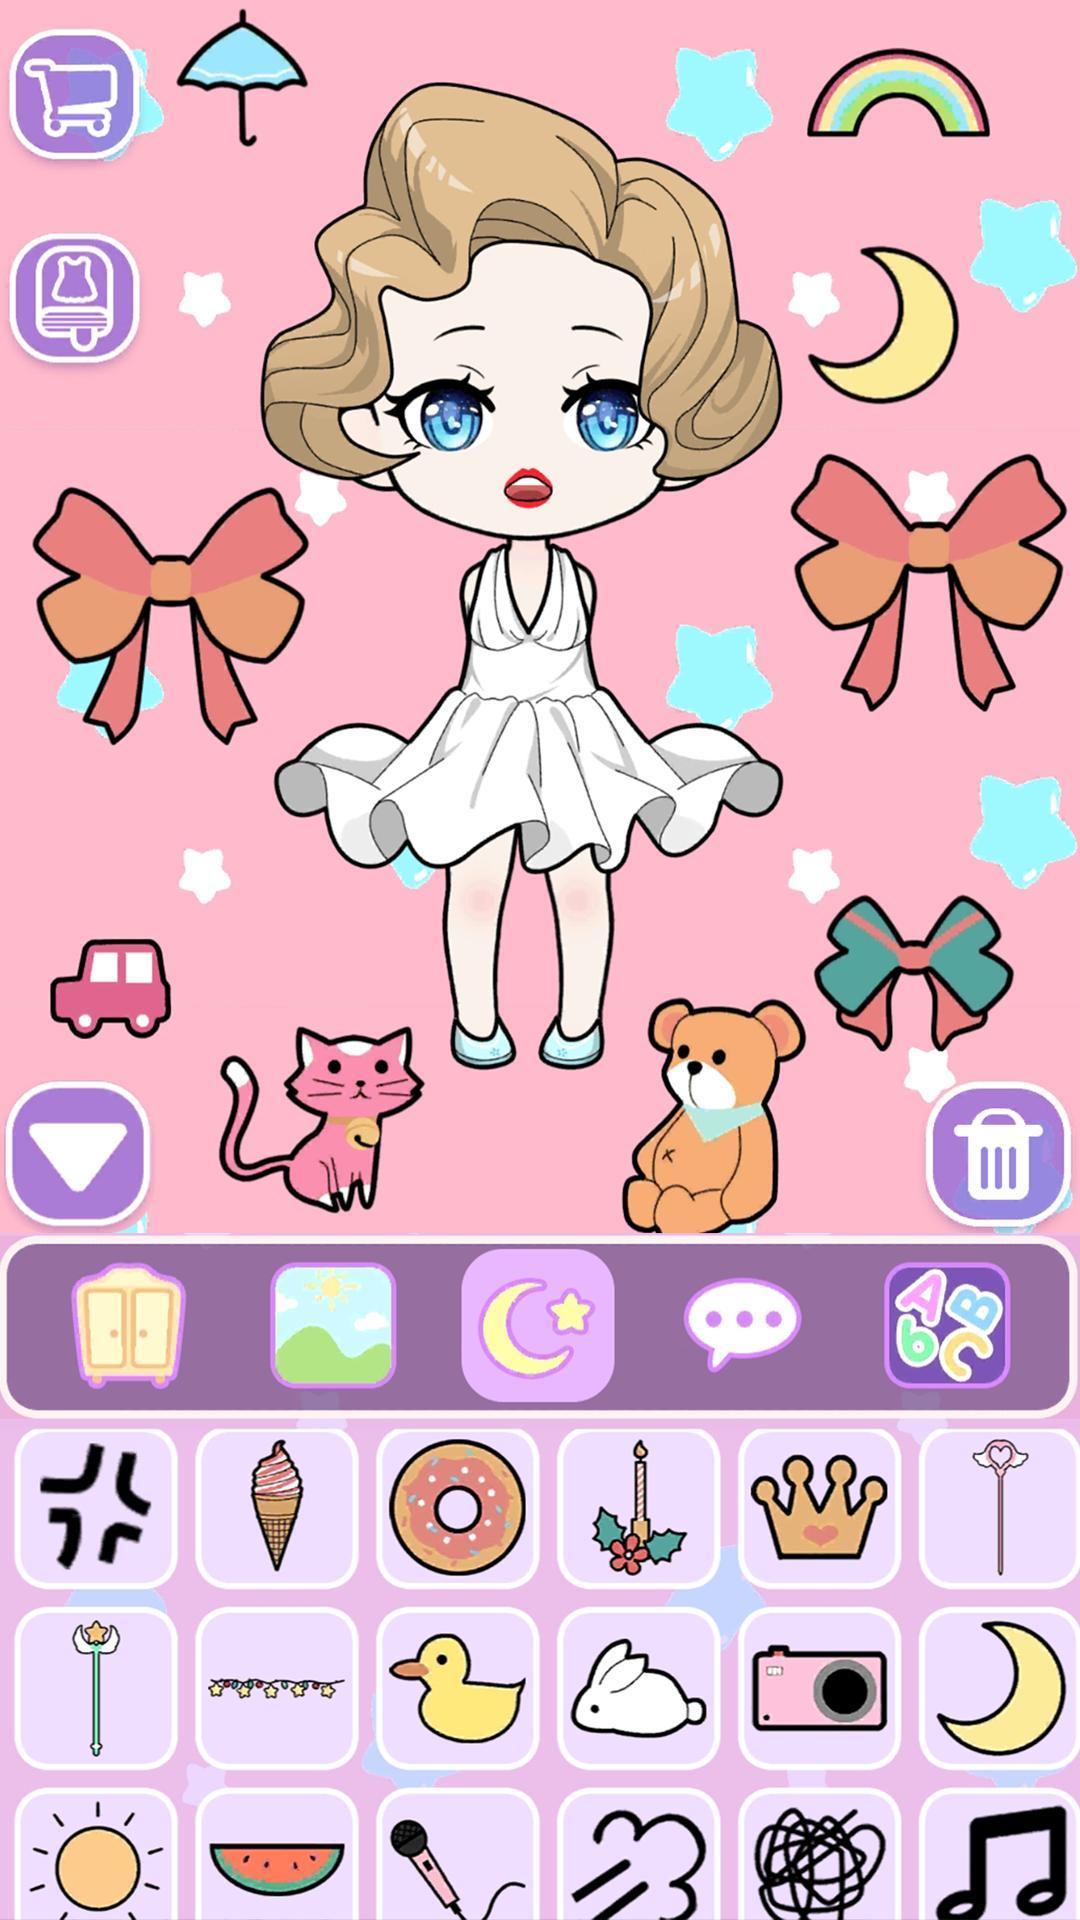 Vlinder Doll Dress up Games , Avatar Creator 1.2.1 Screenshot 11